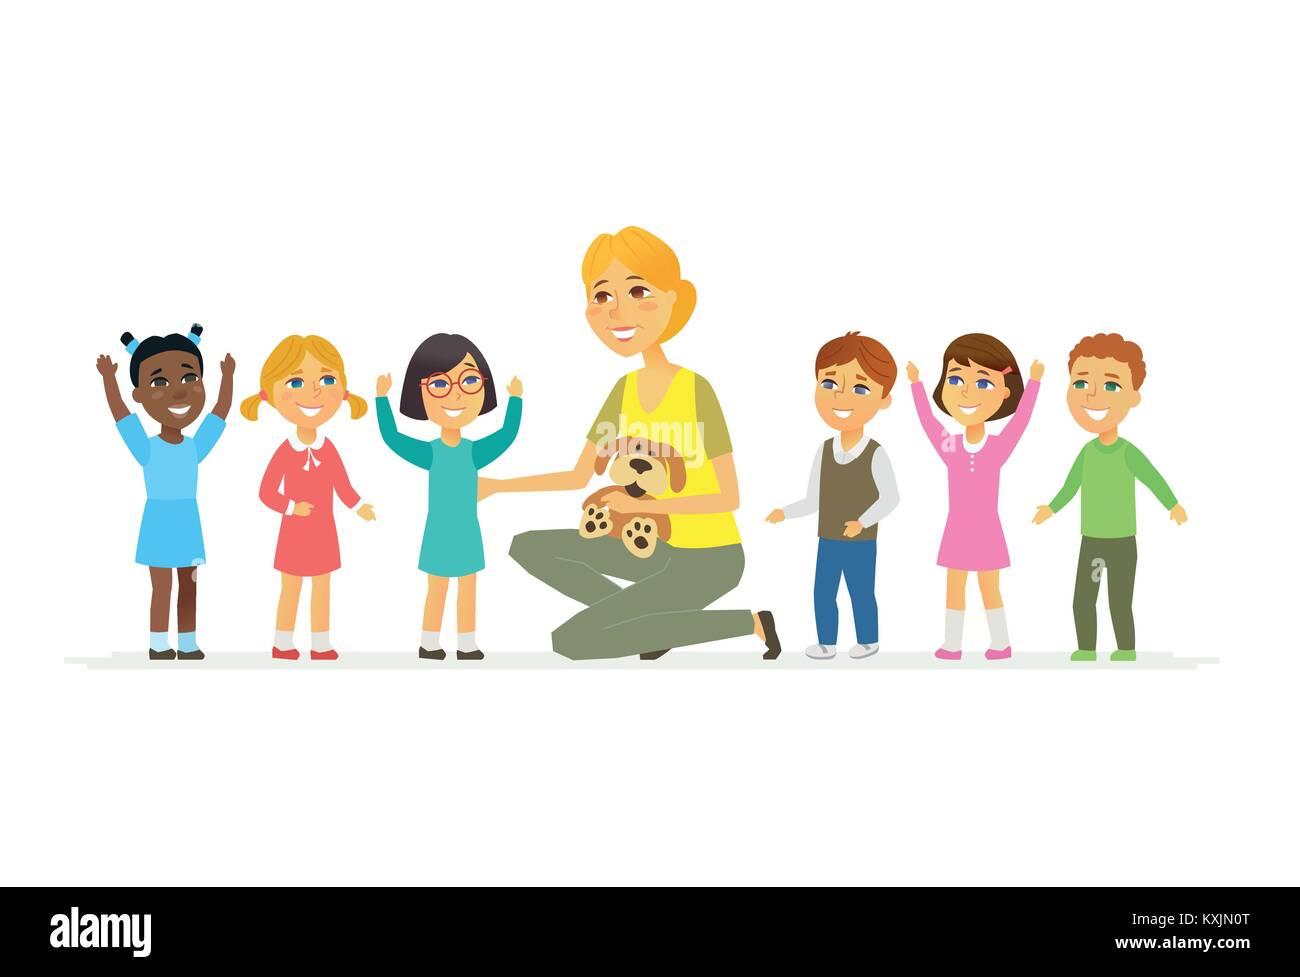 Nursery teacher with children - cartoon people characters isolated illustration - Stock Vector